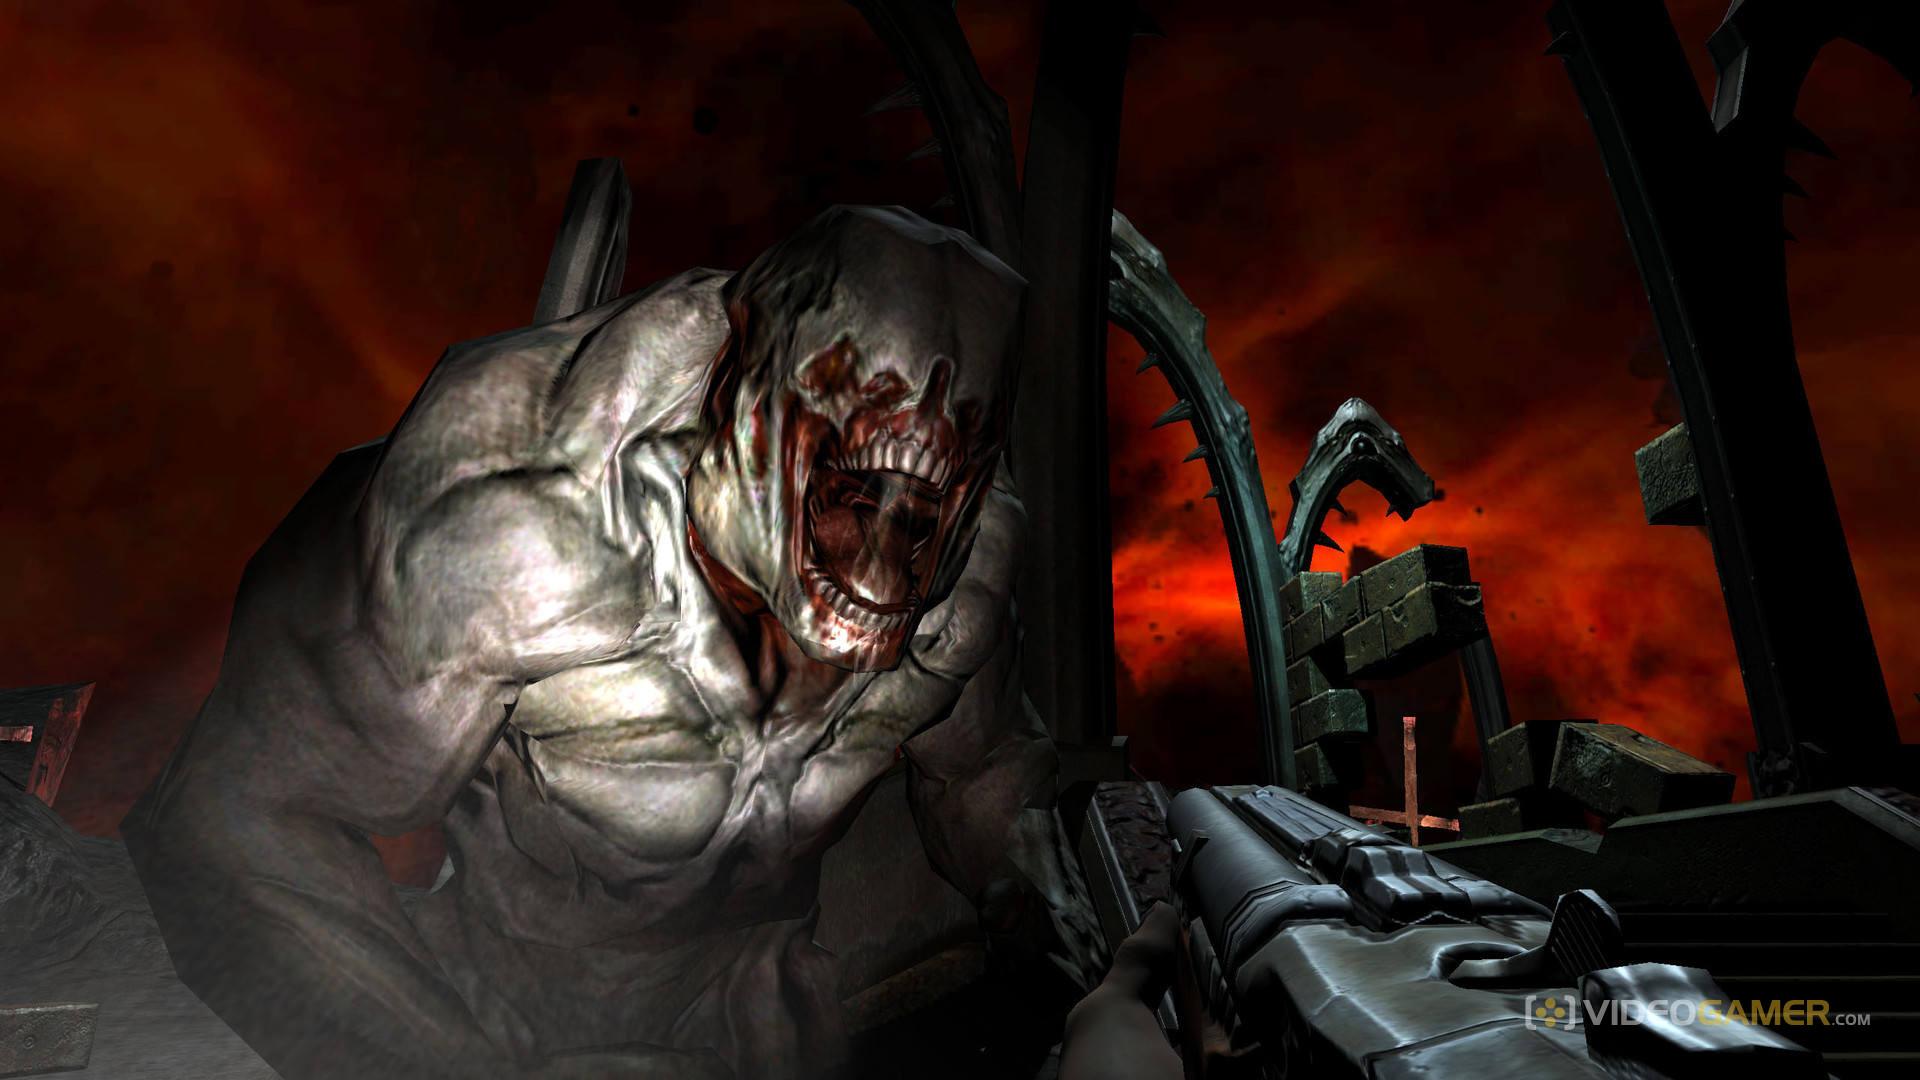 Doom 3 BFG Edition screenshot 14 for PS3   VideoGamercom 1920x1080